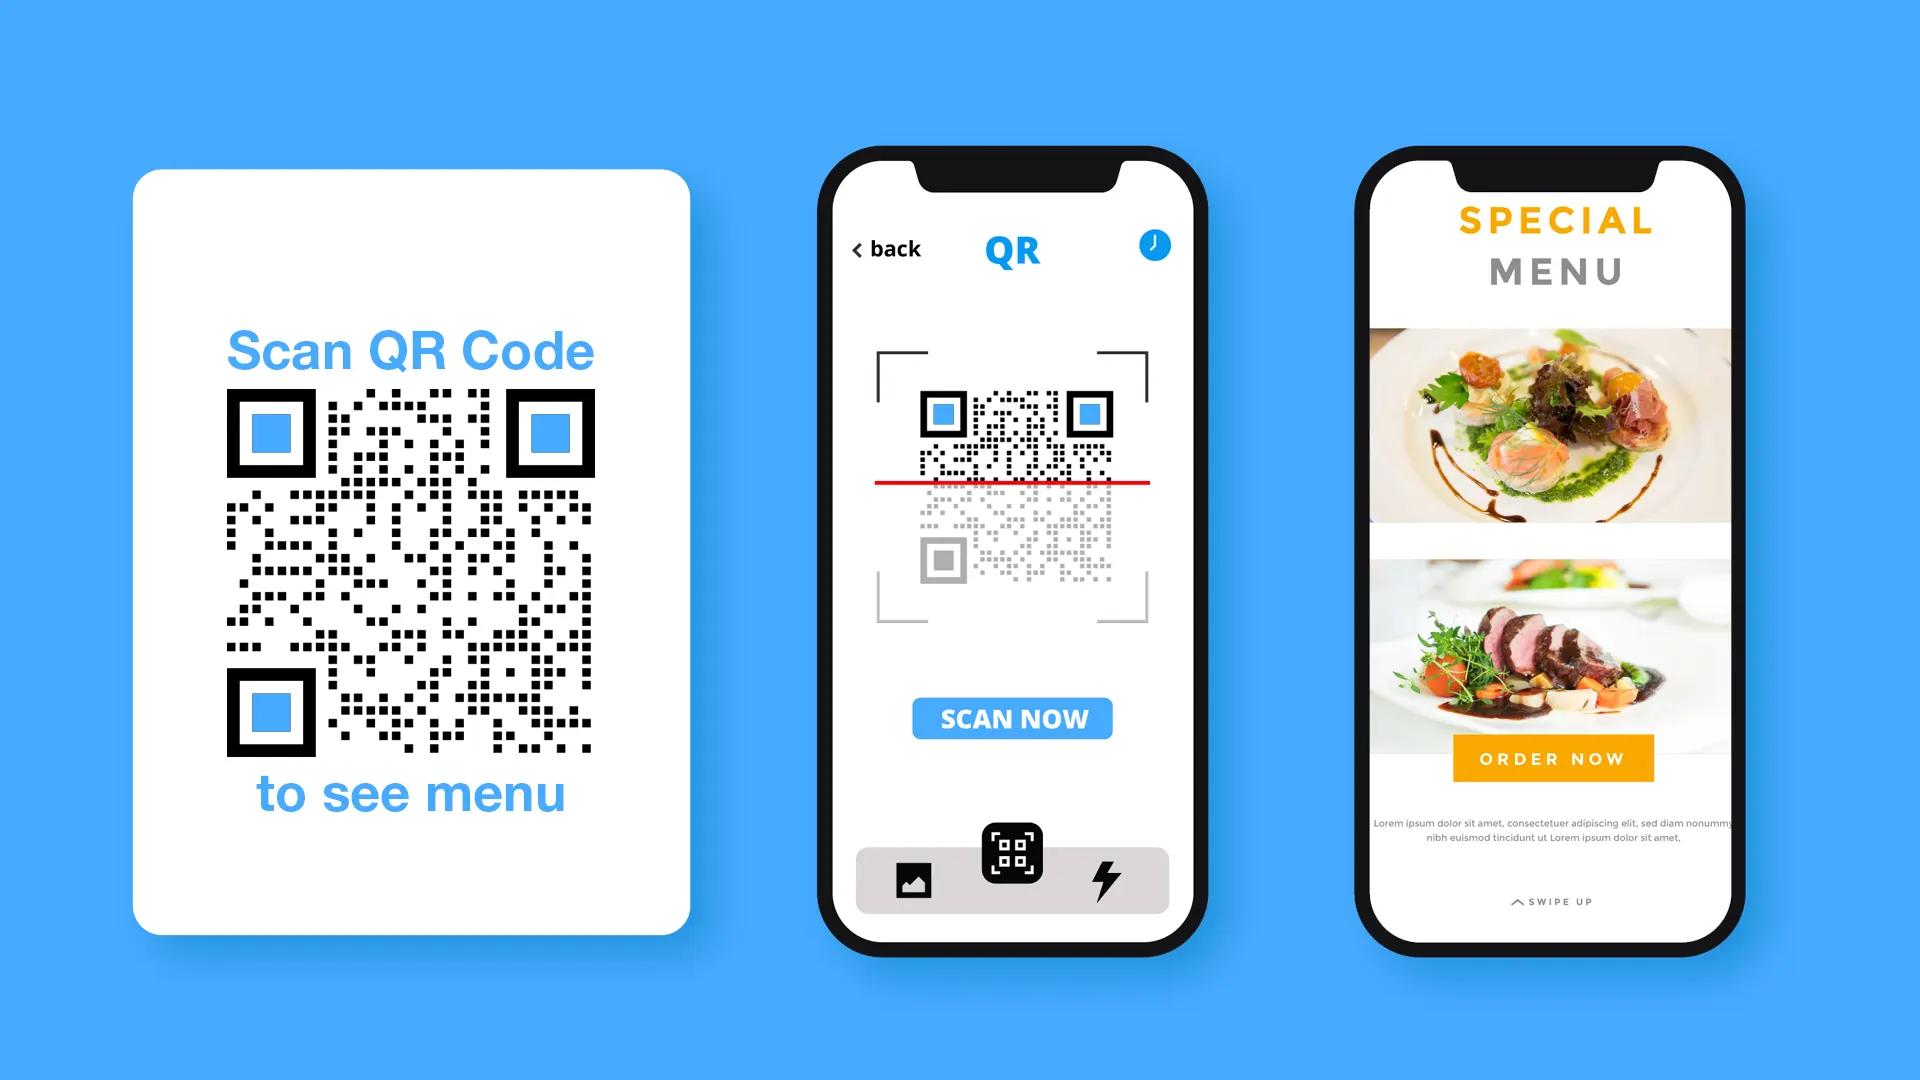 image qr code restaurant menu